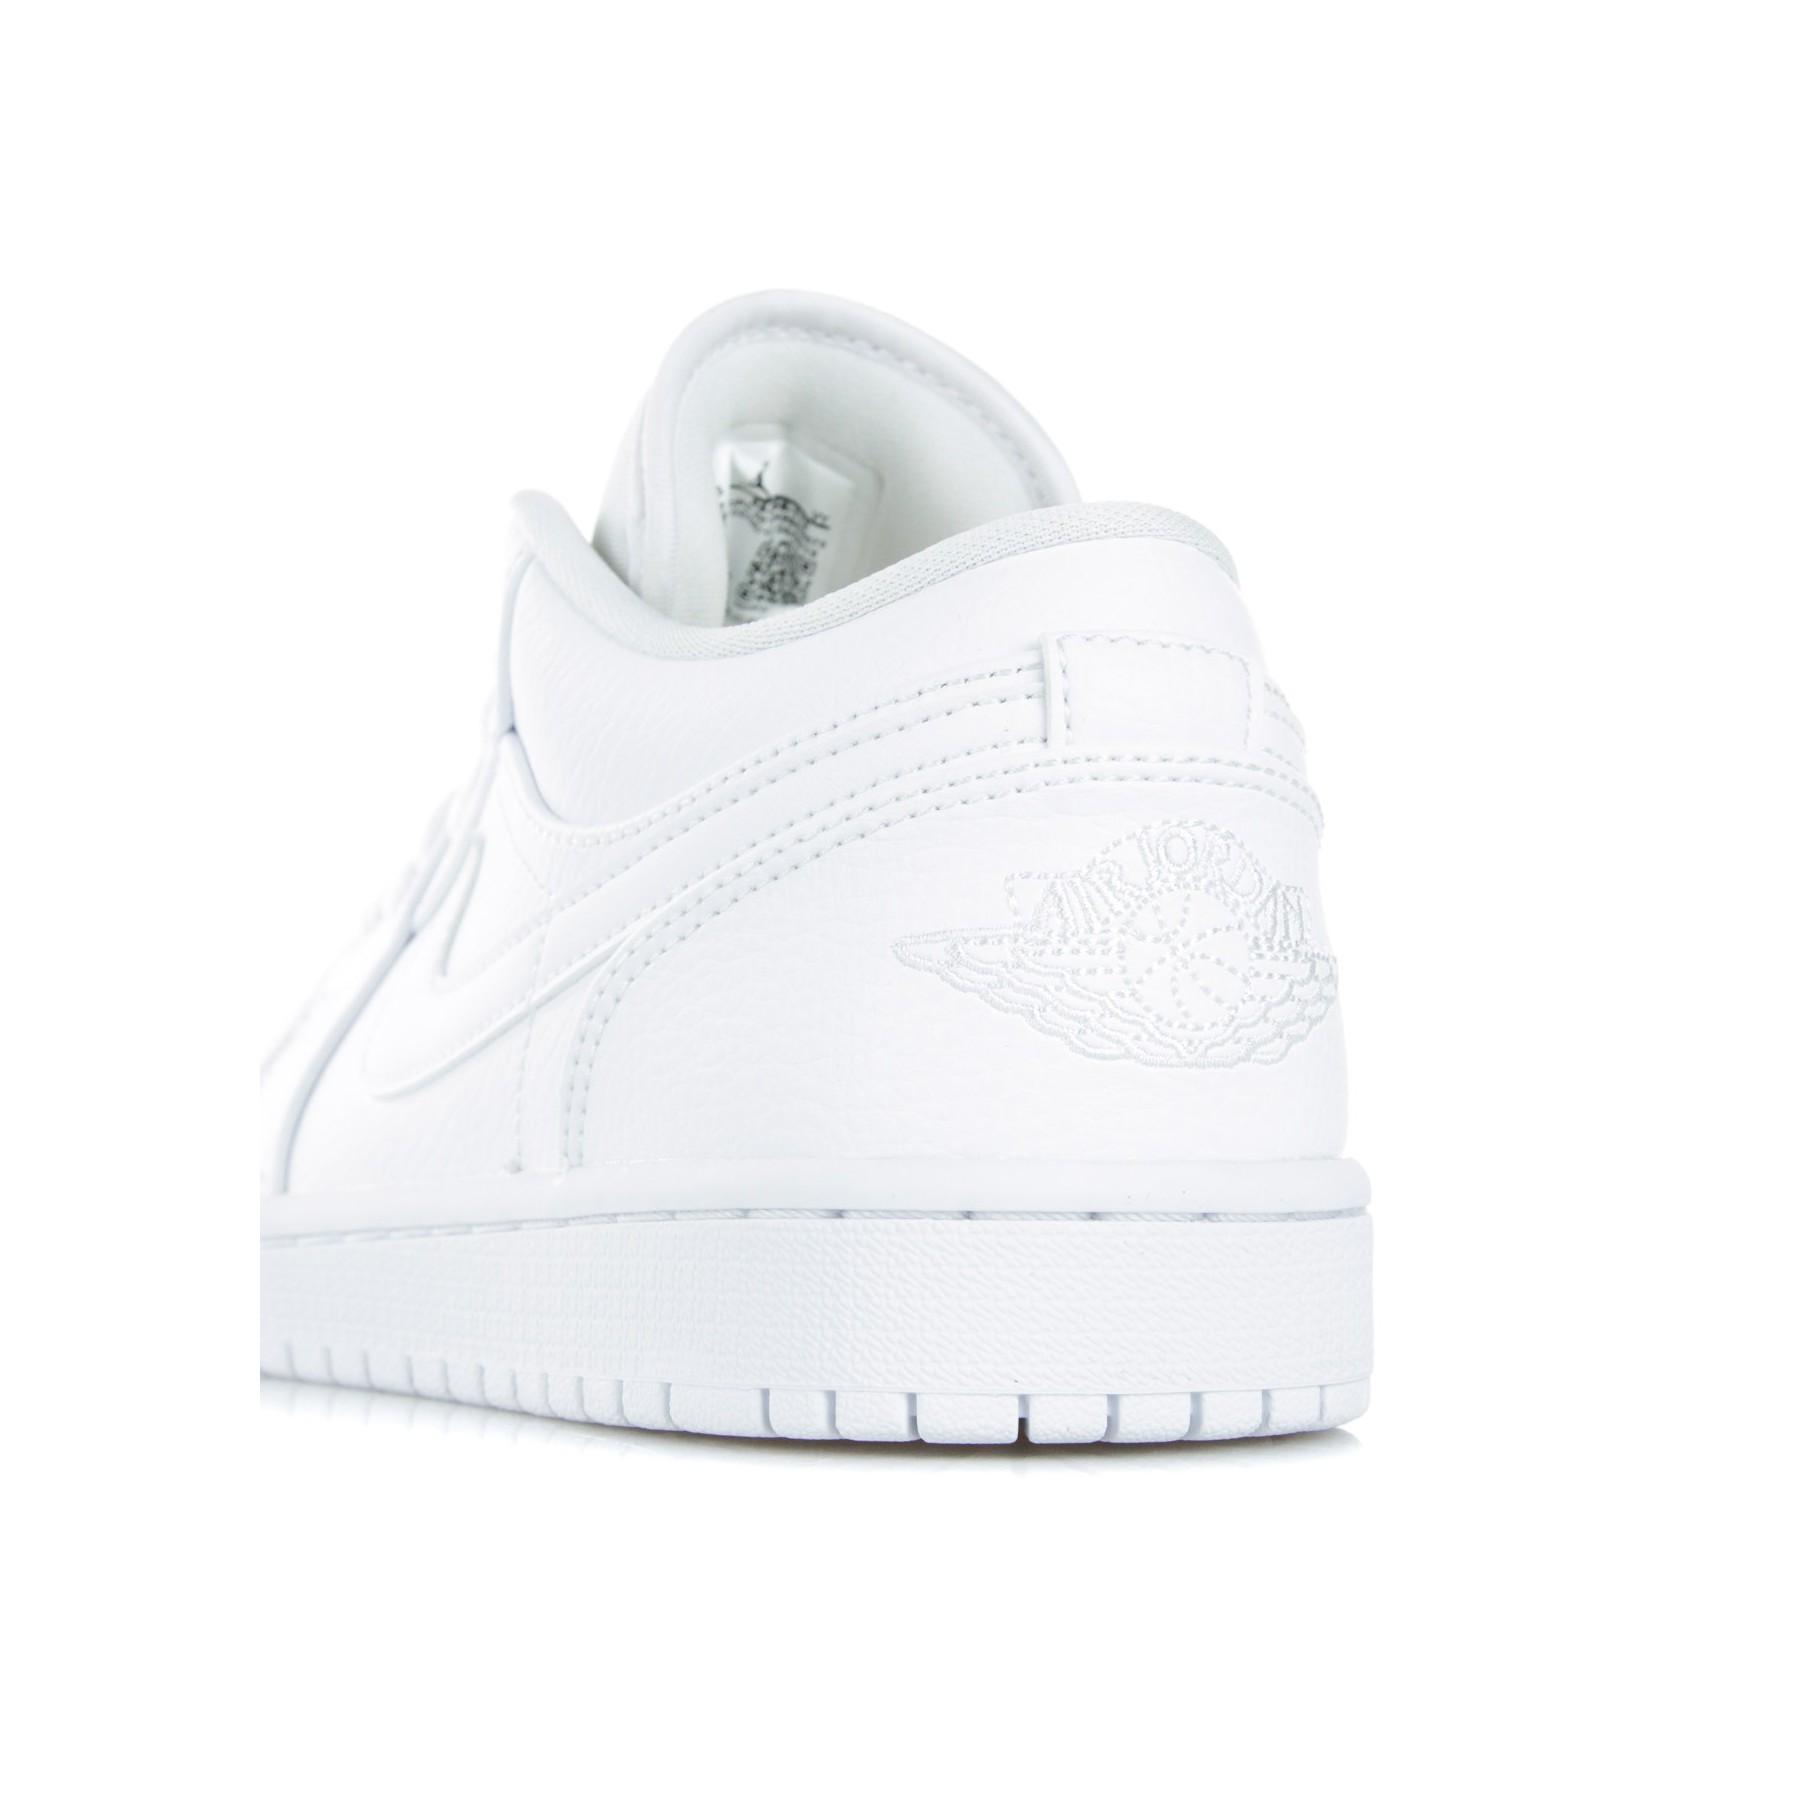 new style 41063 94434 Bassa Low 1 Jordan Whitewhitewhite Air Scarpa v0mNwn8